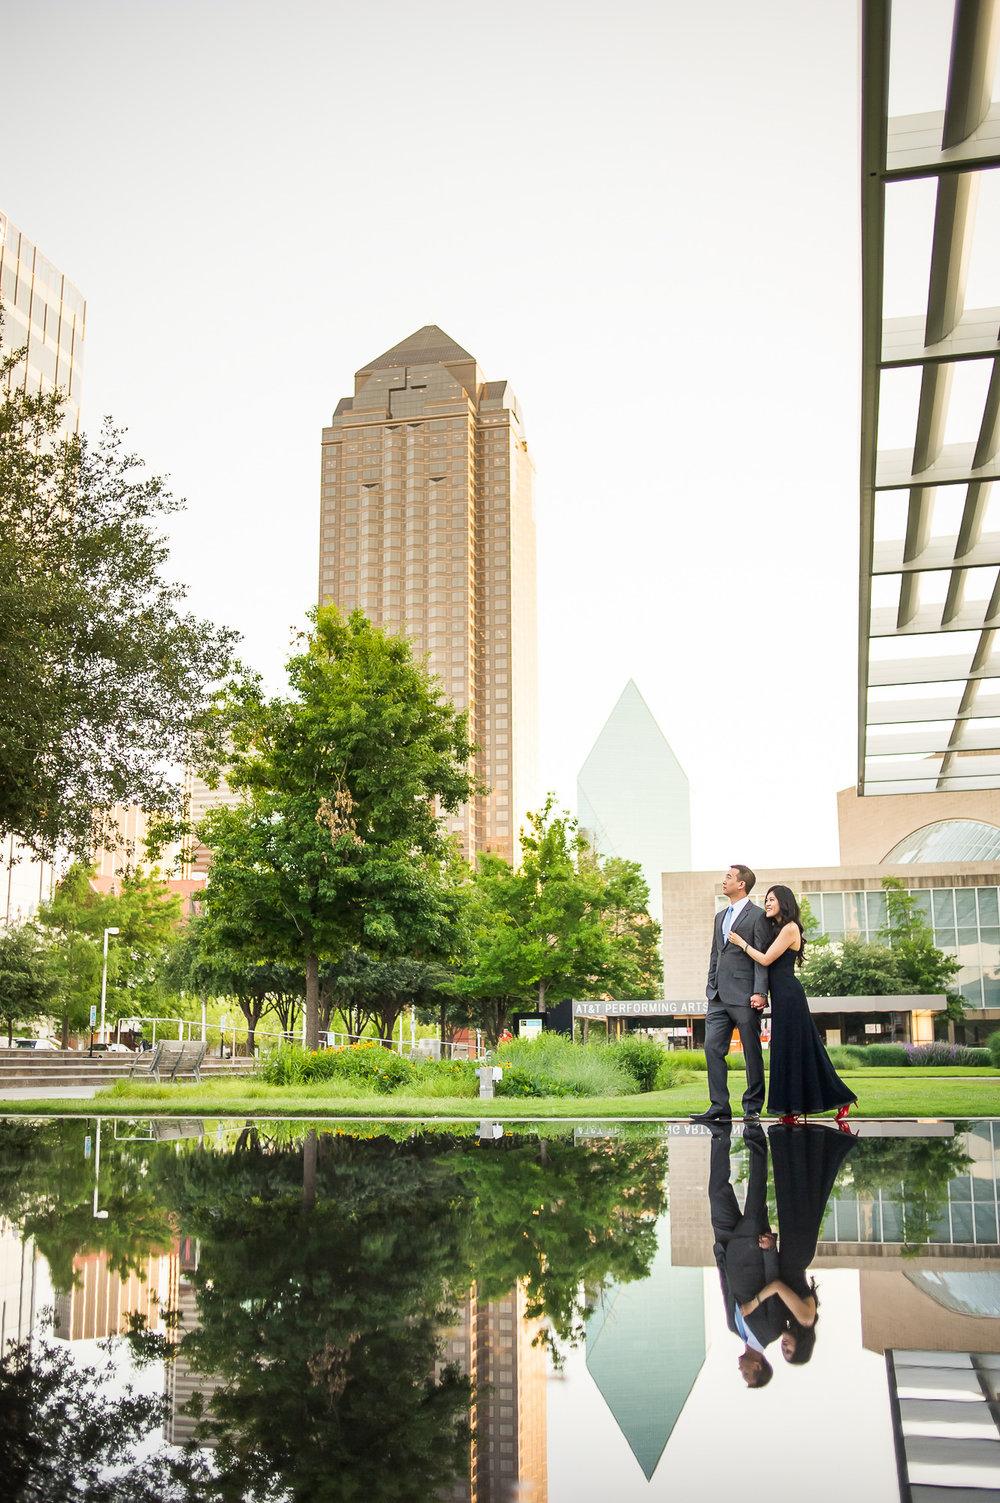 91-David Loi Studios - Dallas Texas - DFW - One Arts Plaza-21531.jpg